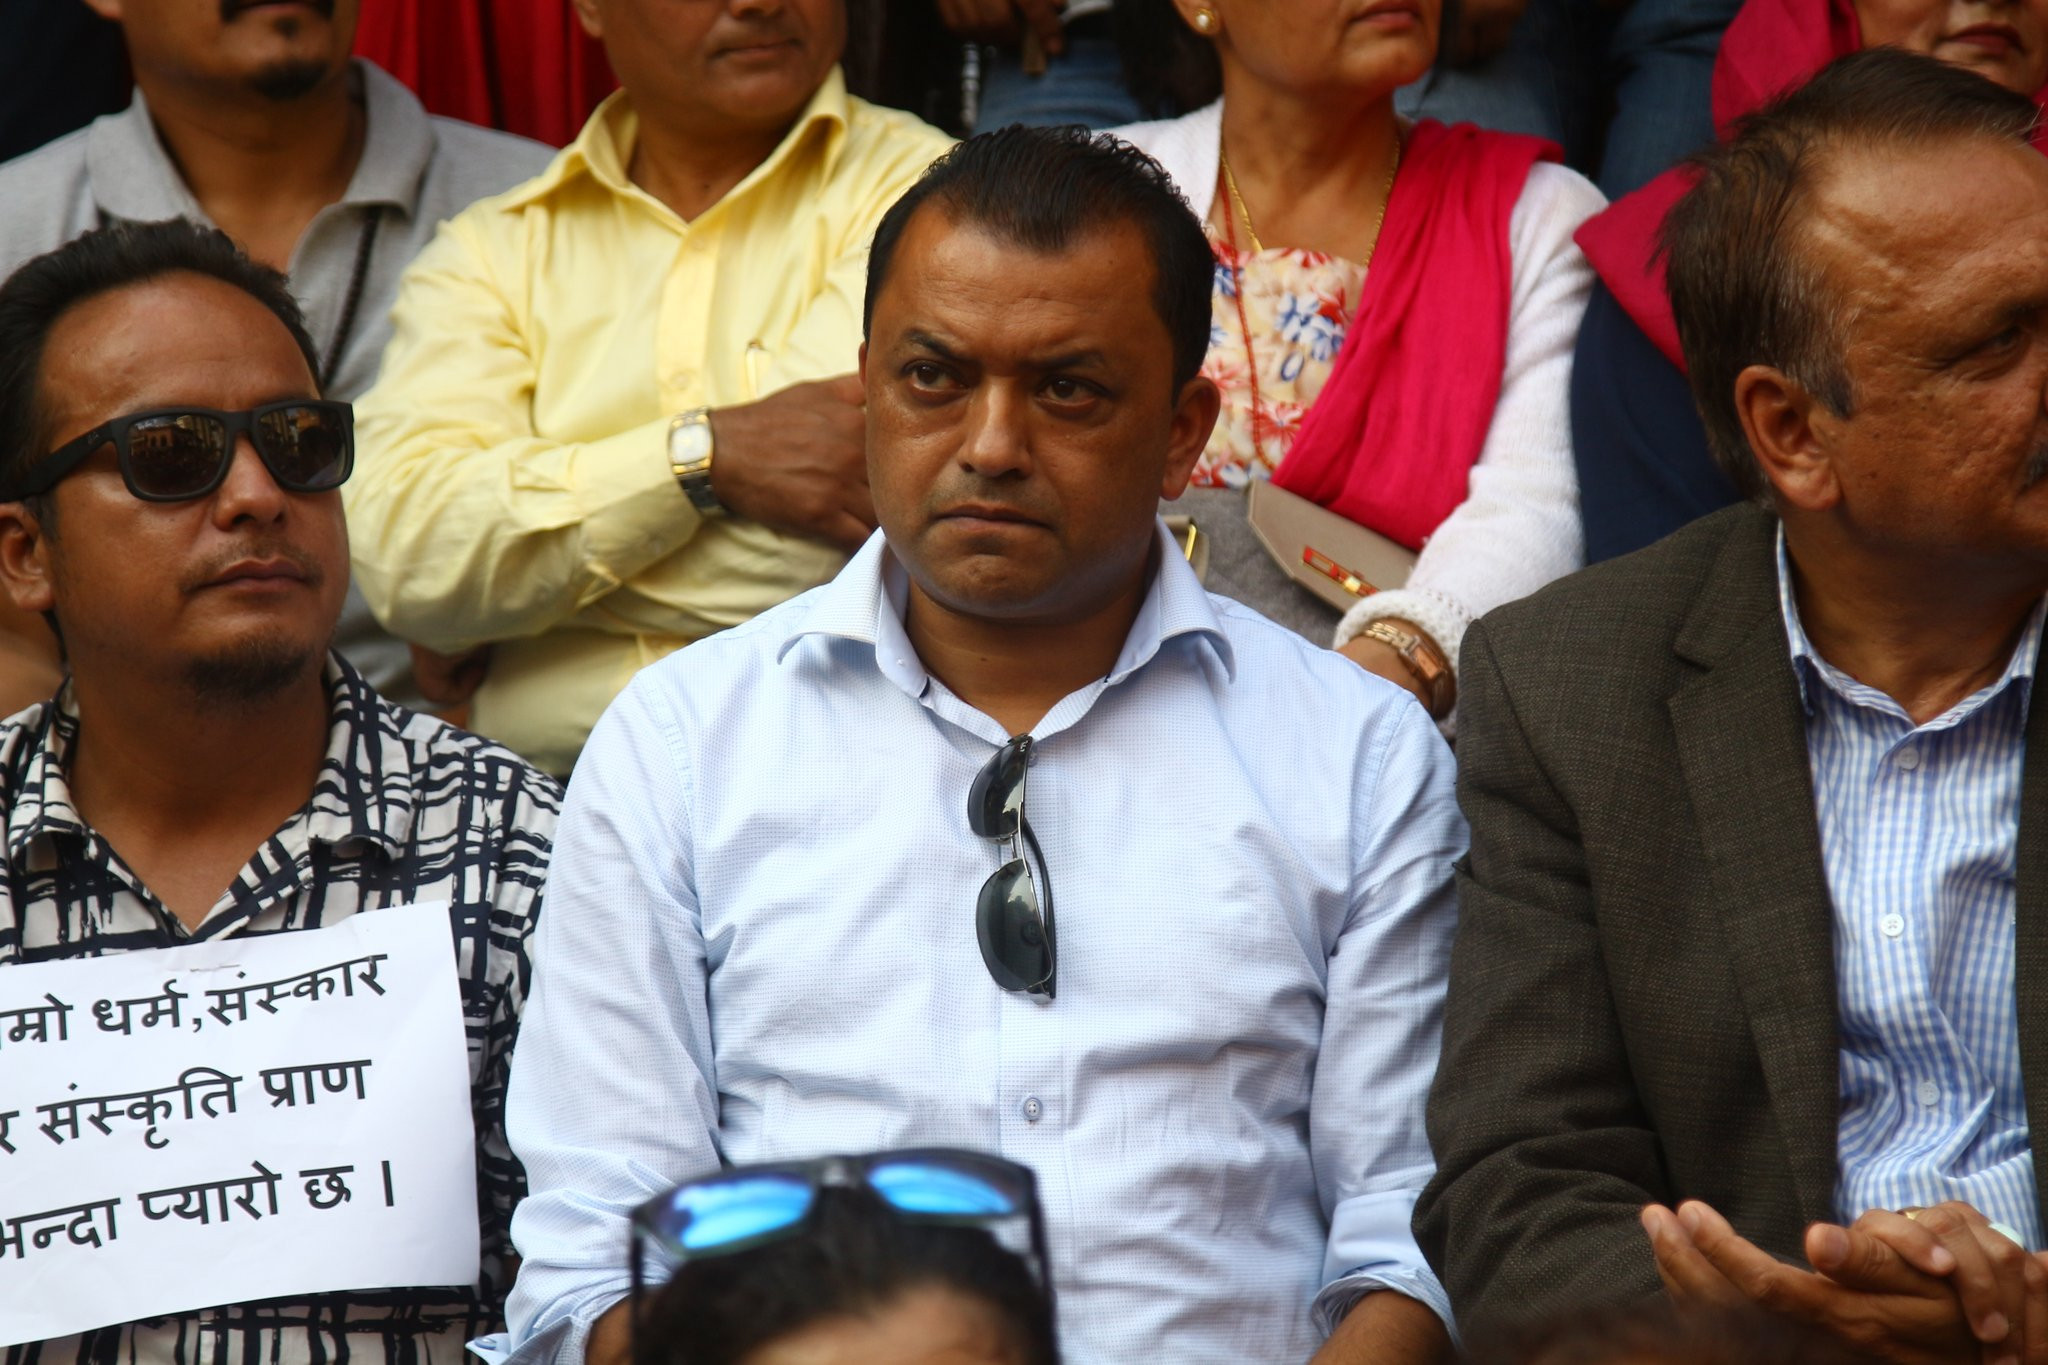 गुठी विधेयकविरूद्ध नेपाली कांग्रेसद्वारा आइतबार राजधानीमा आयोजित विरोध सभा। तस्बिर: निशा भण्डारी/सेतोपाटी